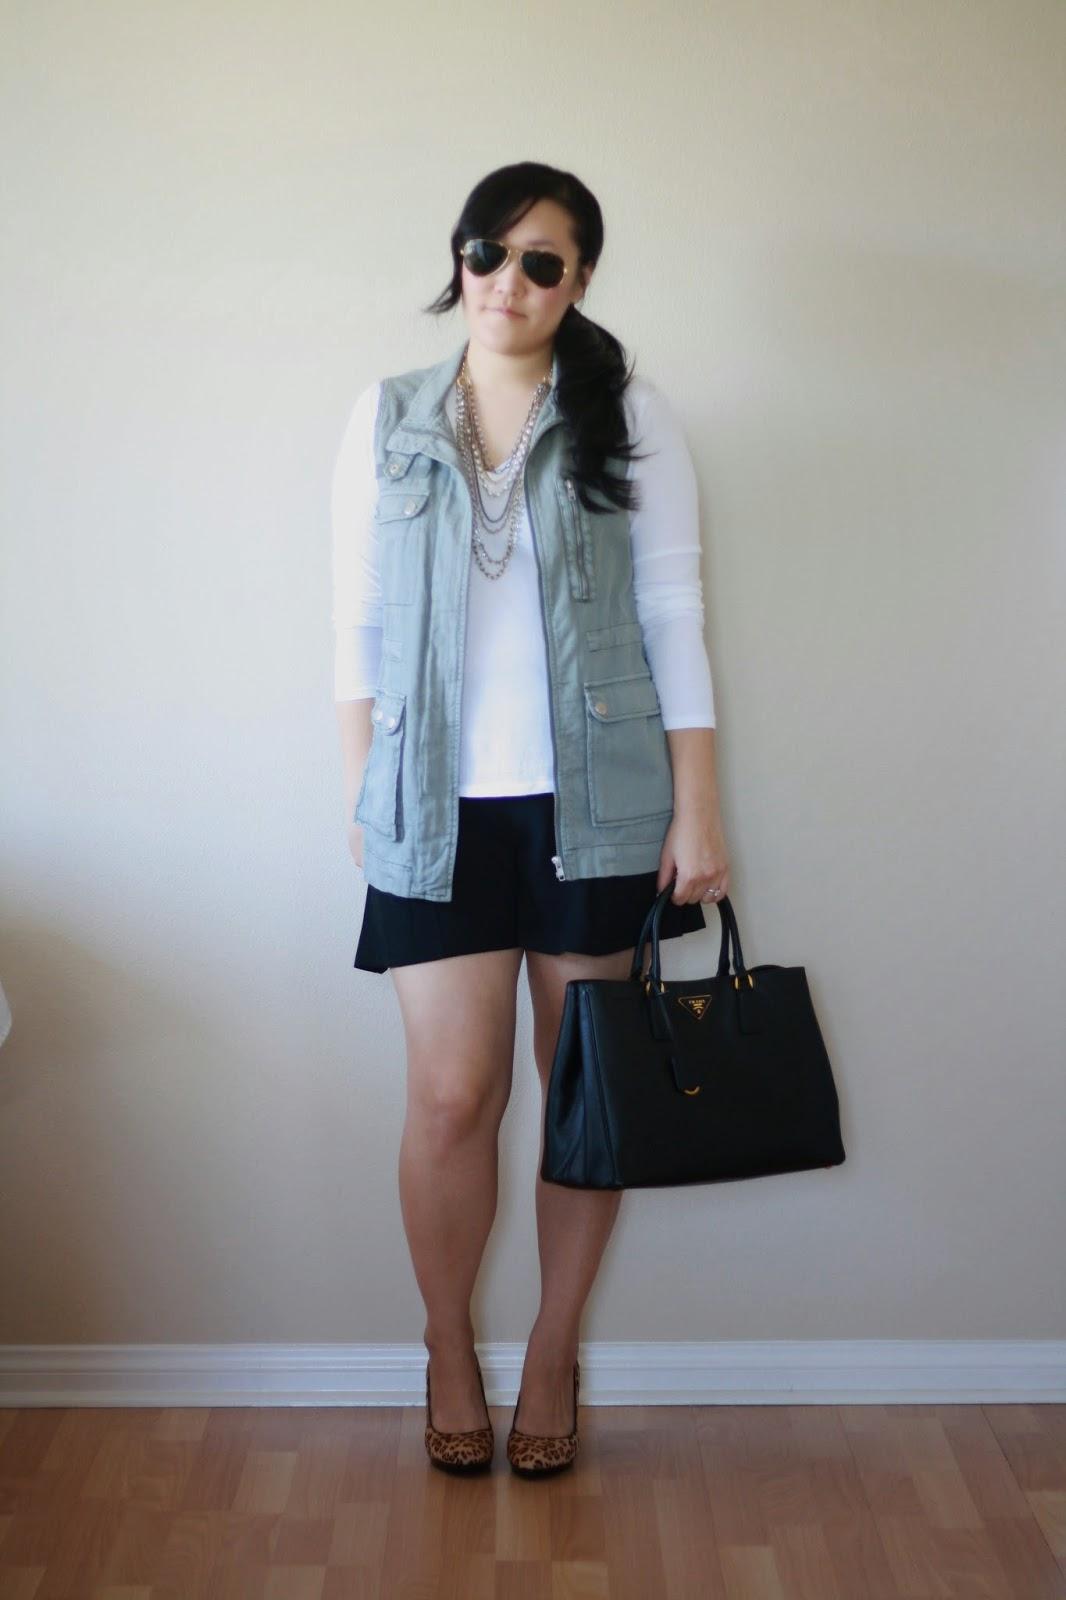 blogger, style blogger, fashion blogger, preppy blogger, ootd, cargo vest, utility vest, prada bag, leopard pumps